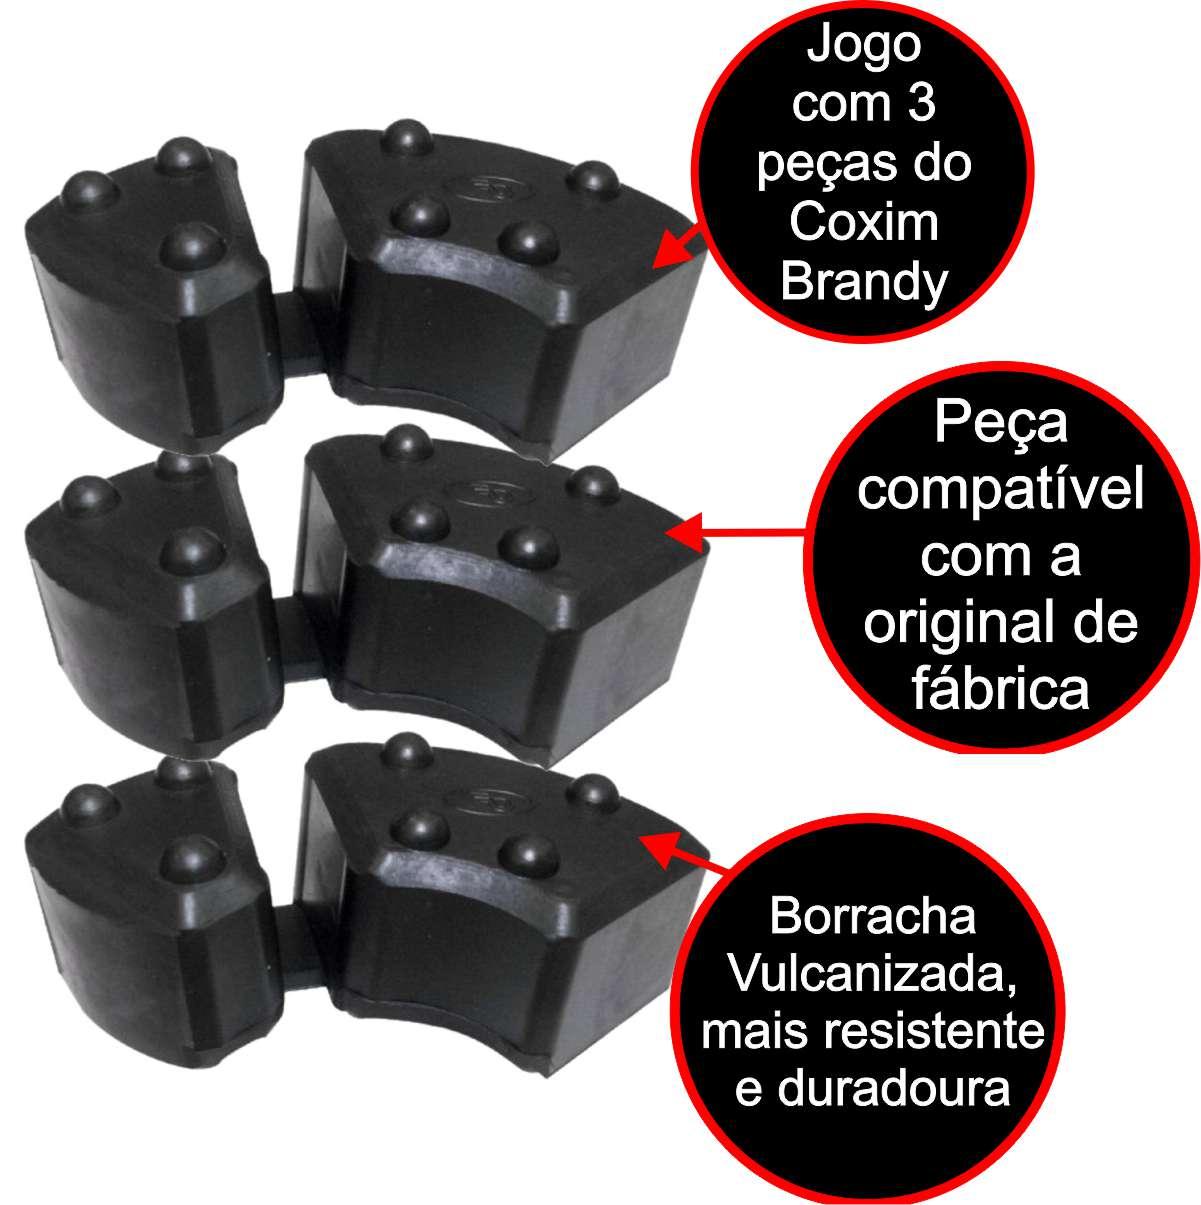 COXIM BRANDY CUBO BORRACHA BUCHA DA COROA RODA DE MOTO BMW G 650 GS ANOS 2009 10 11 12 13 14 15 16